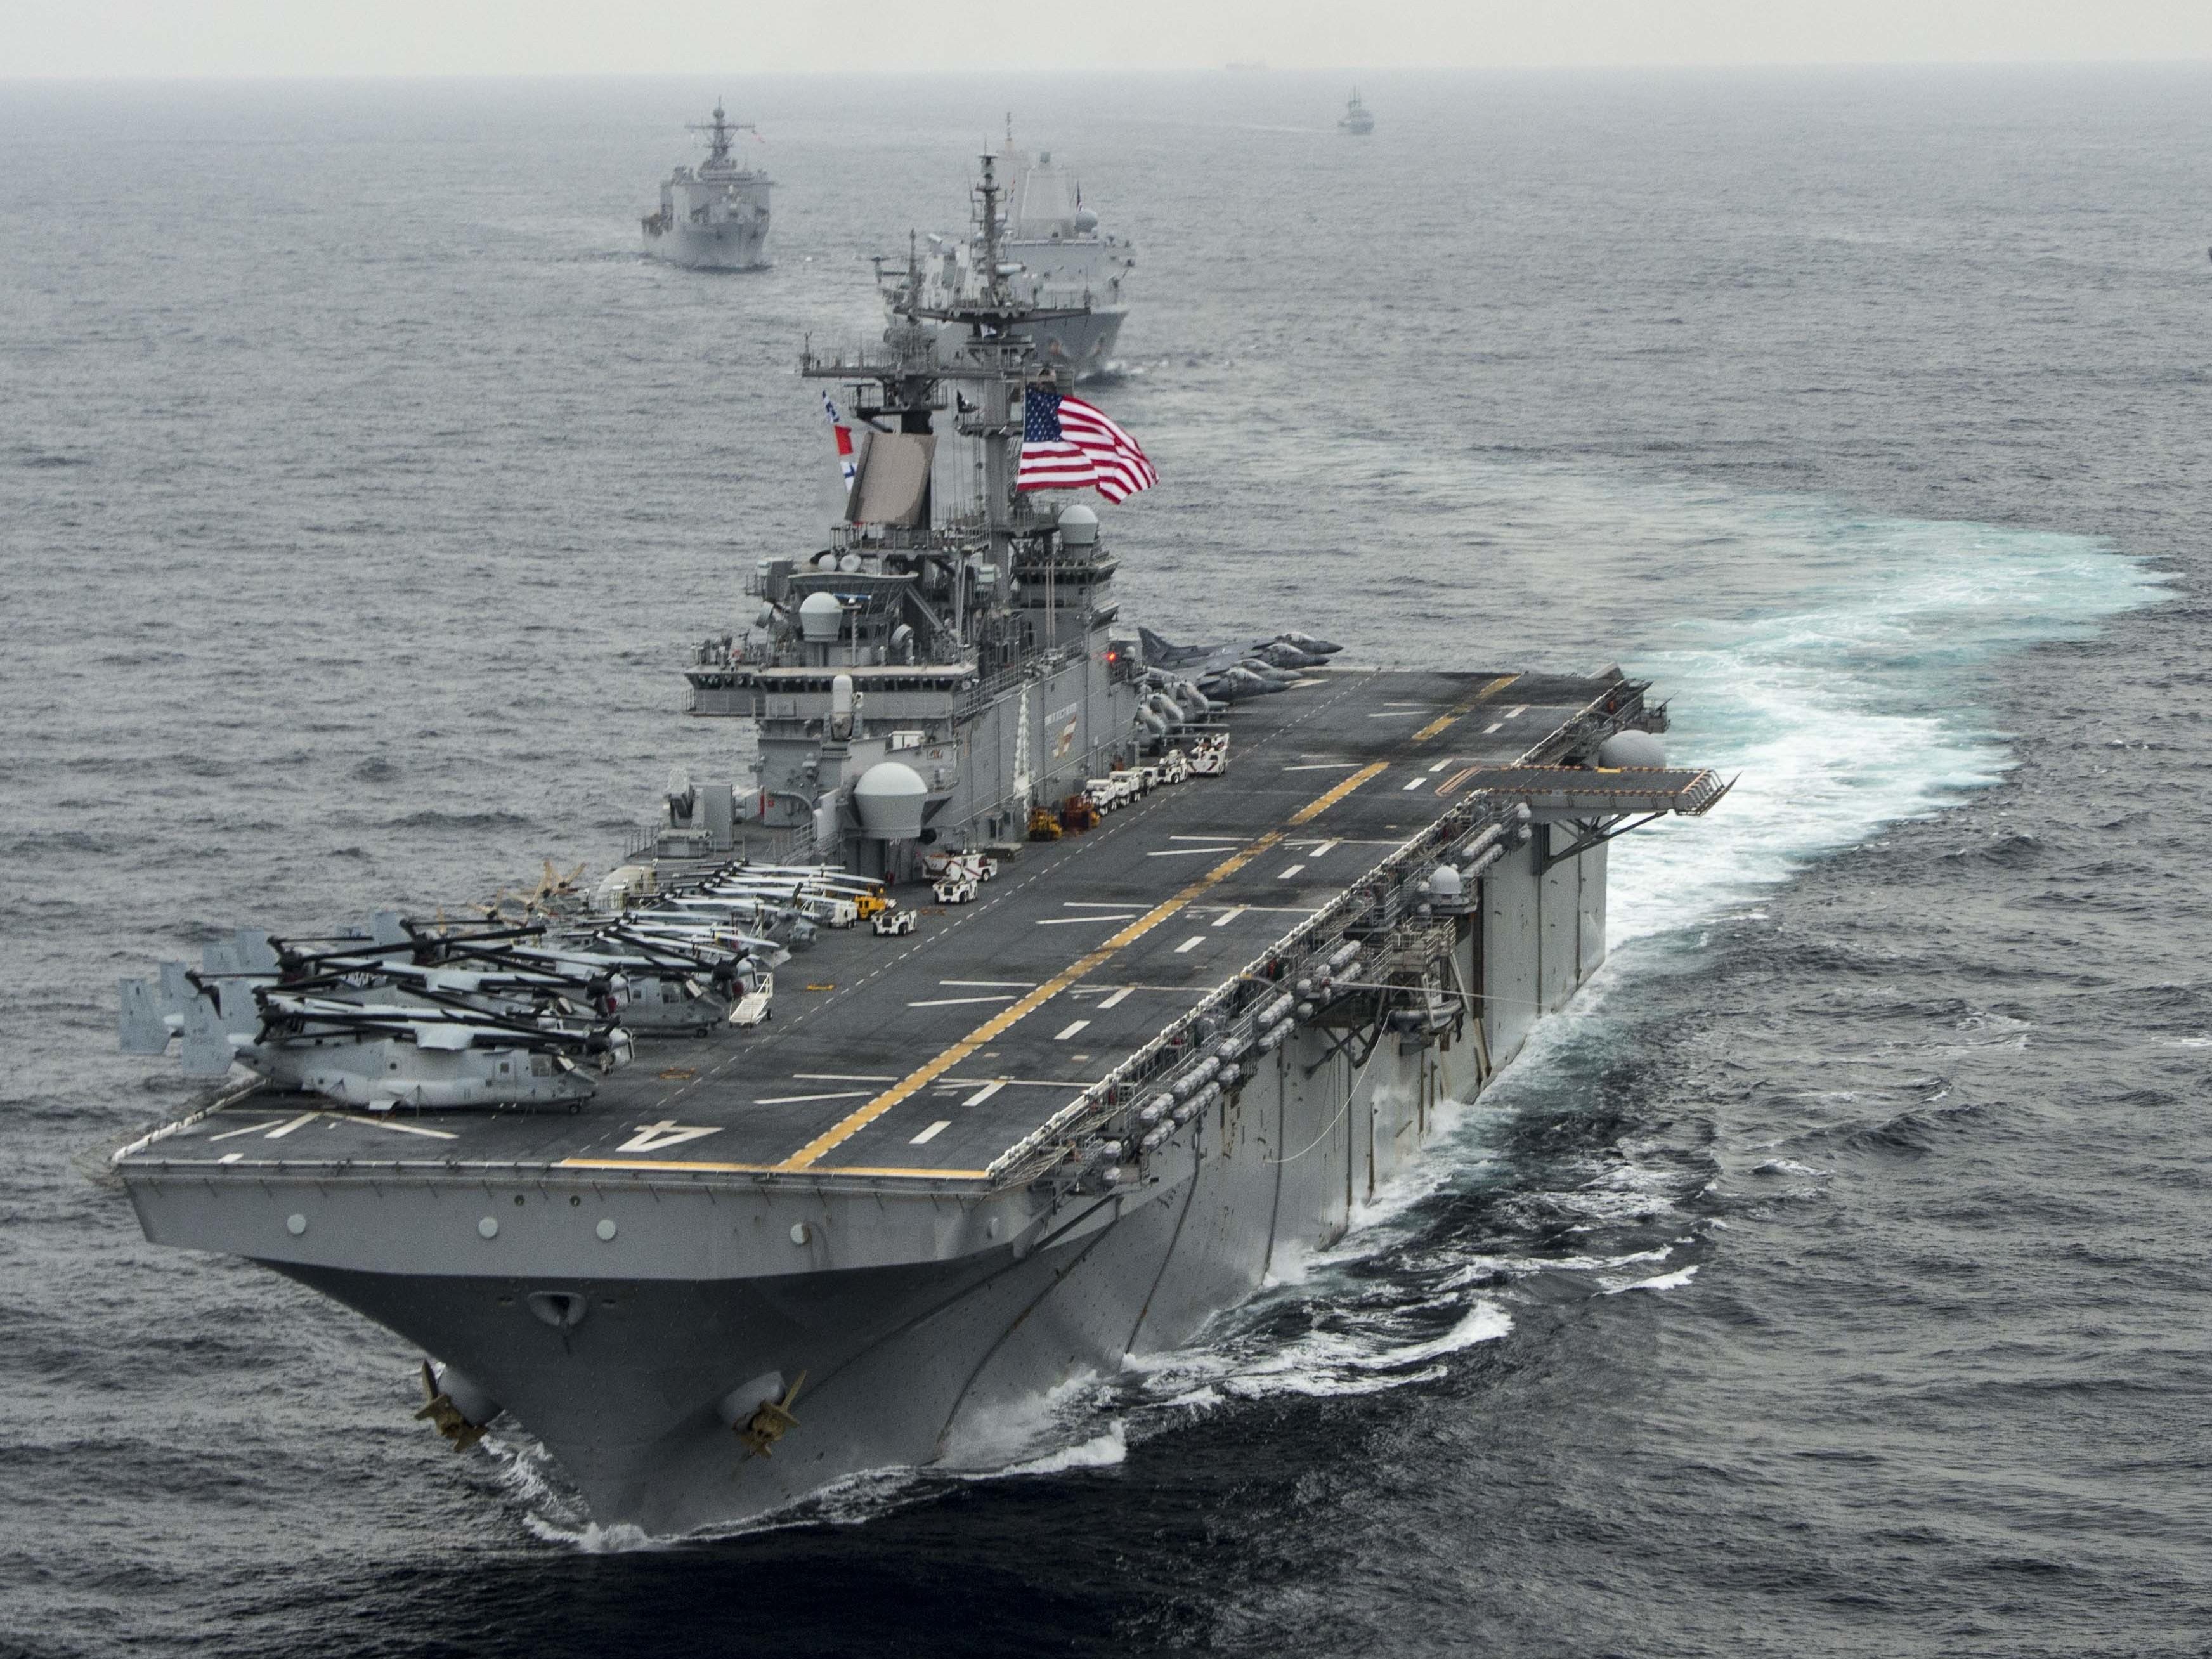 U.S. shot down Iranian drone in Strait of Hormuz, says Trump